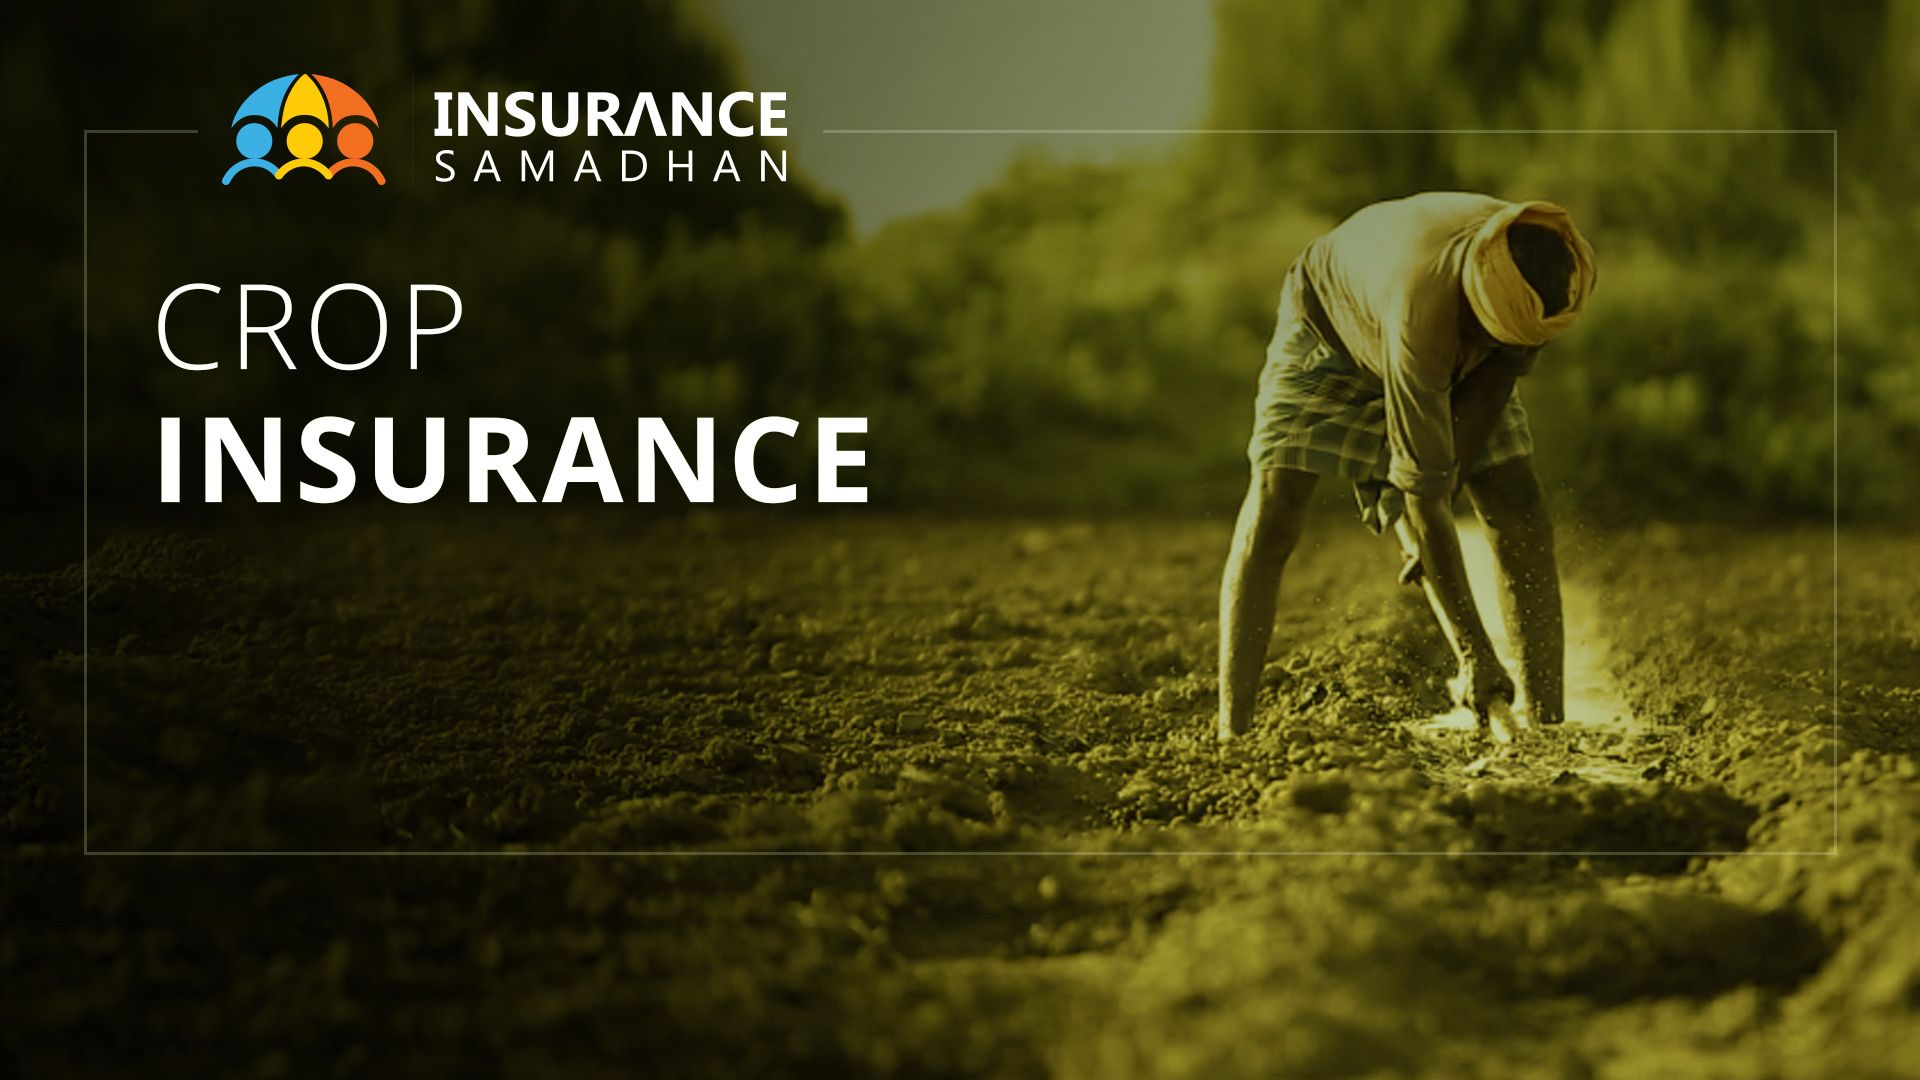 Crop Insurance: Pradhan Mantri Fasal Bima Yojana (PMFBY) Details & Benefits